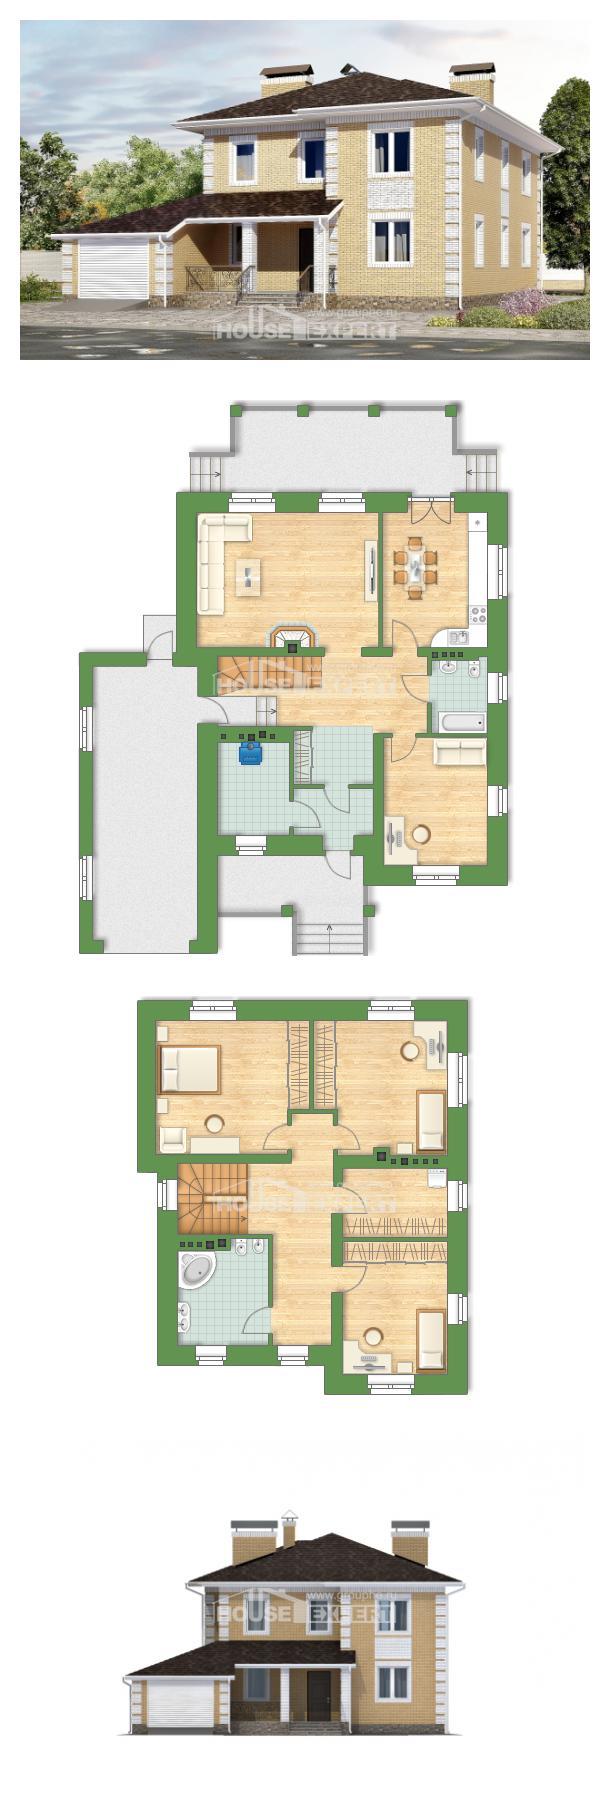 Проект дома 220-006-Л | House Expert